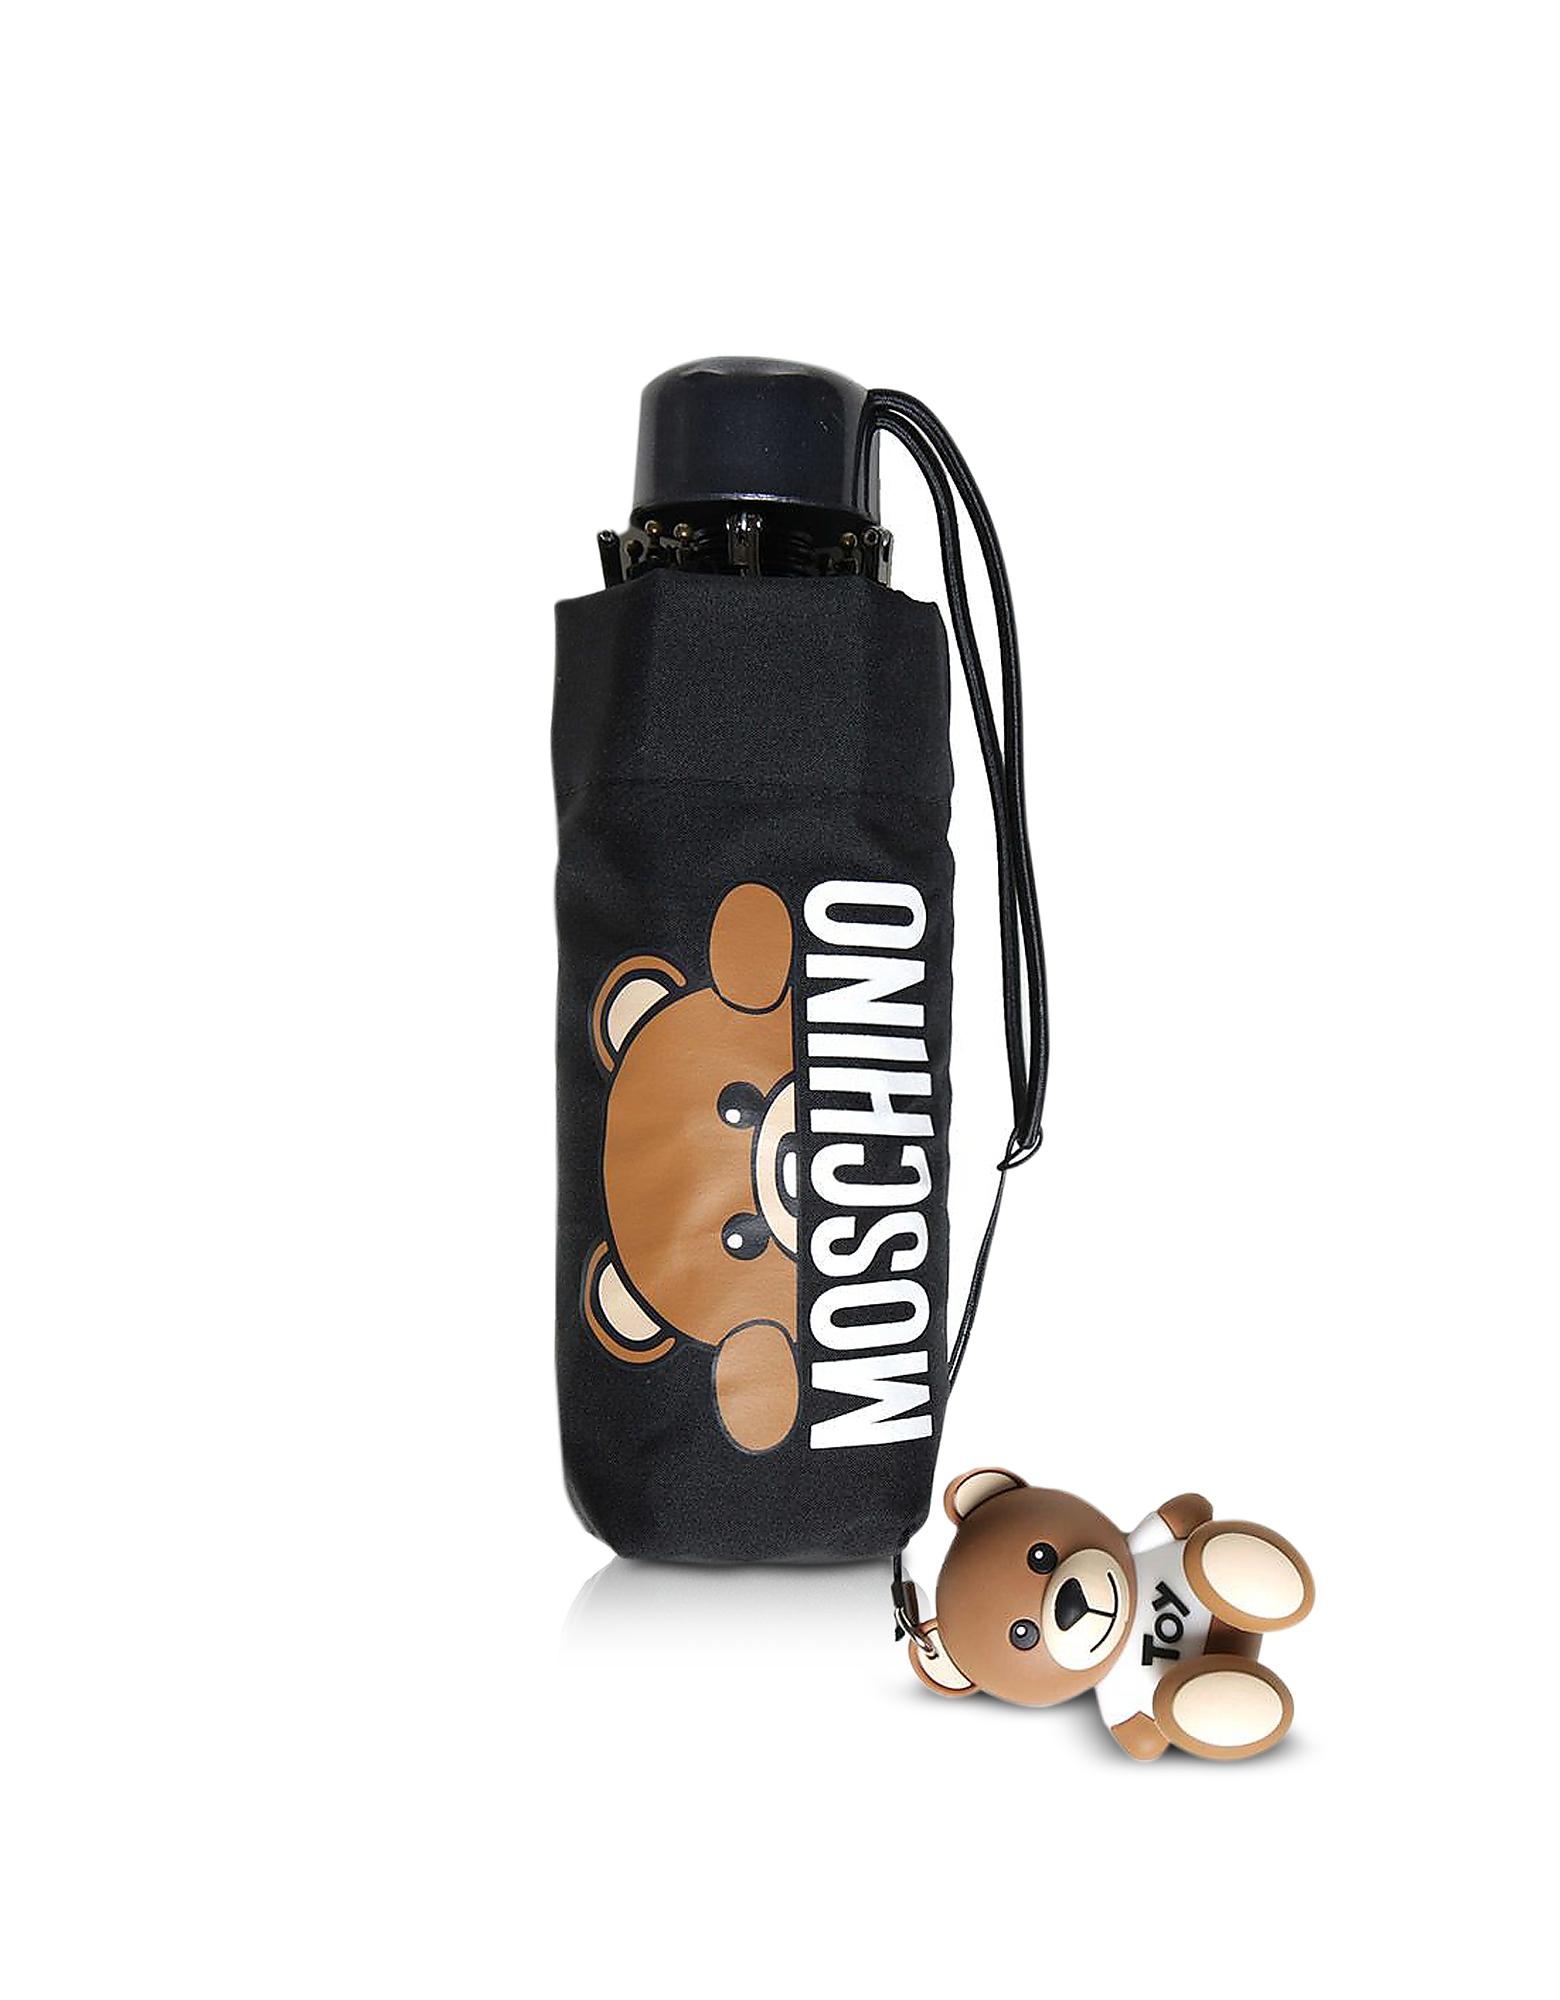 Hidden Teddy Bear Black Supermini Umbrella